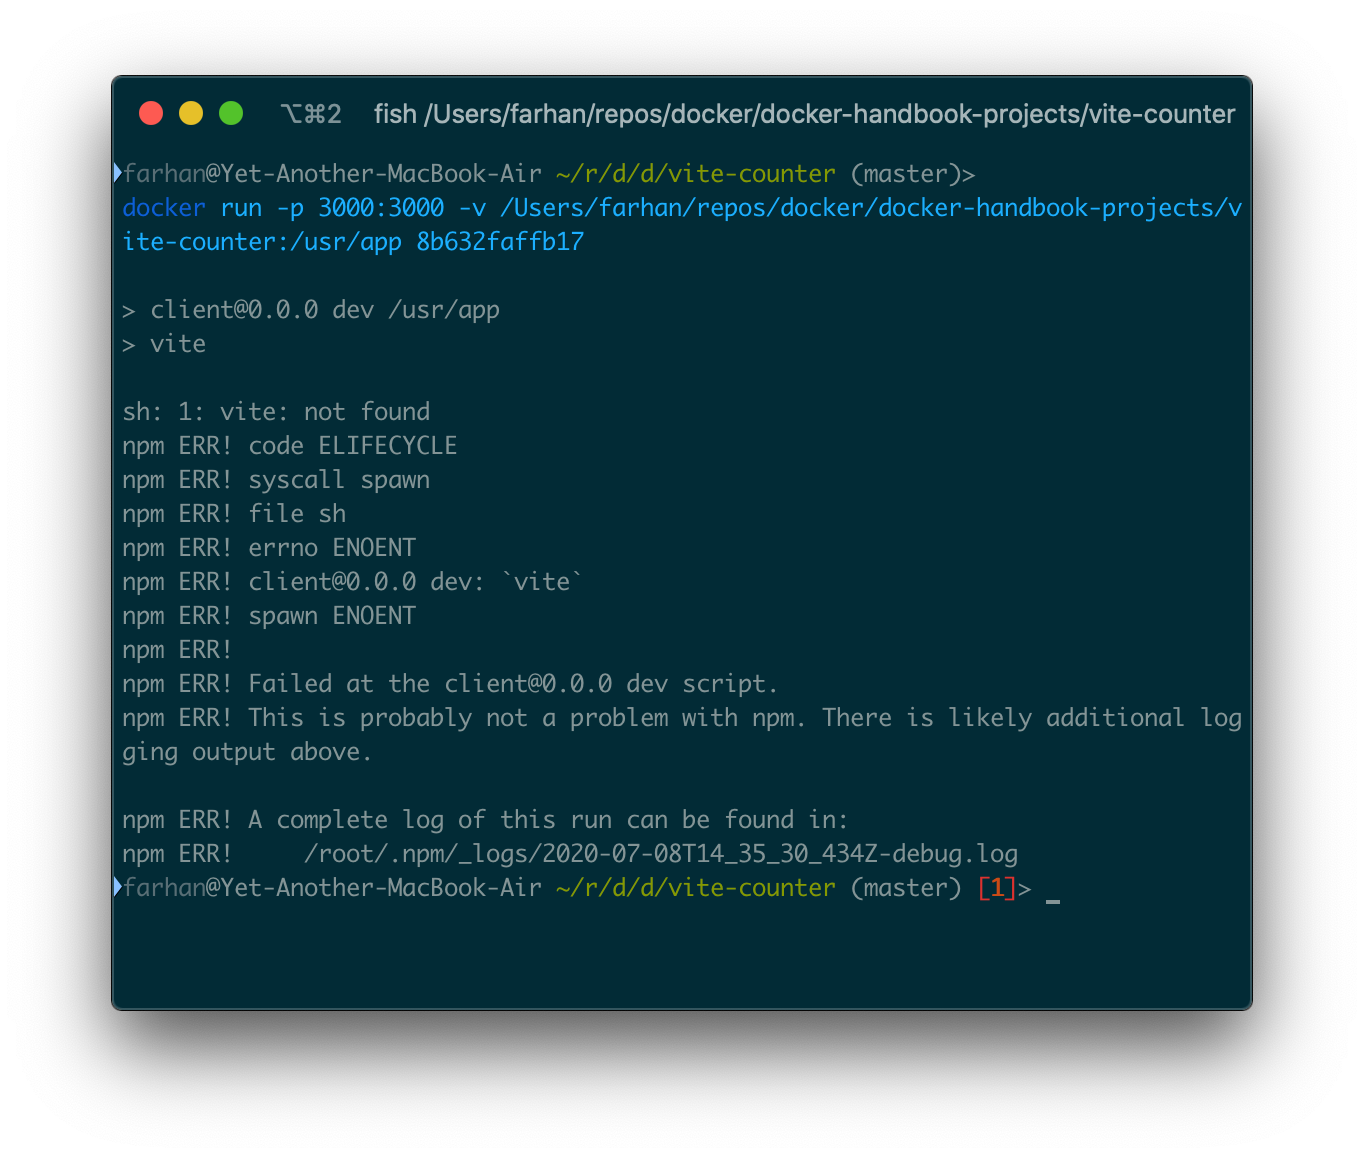 sh: 1: vite: not found error output